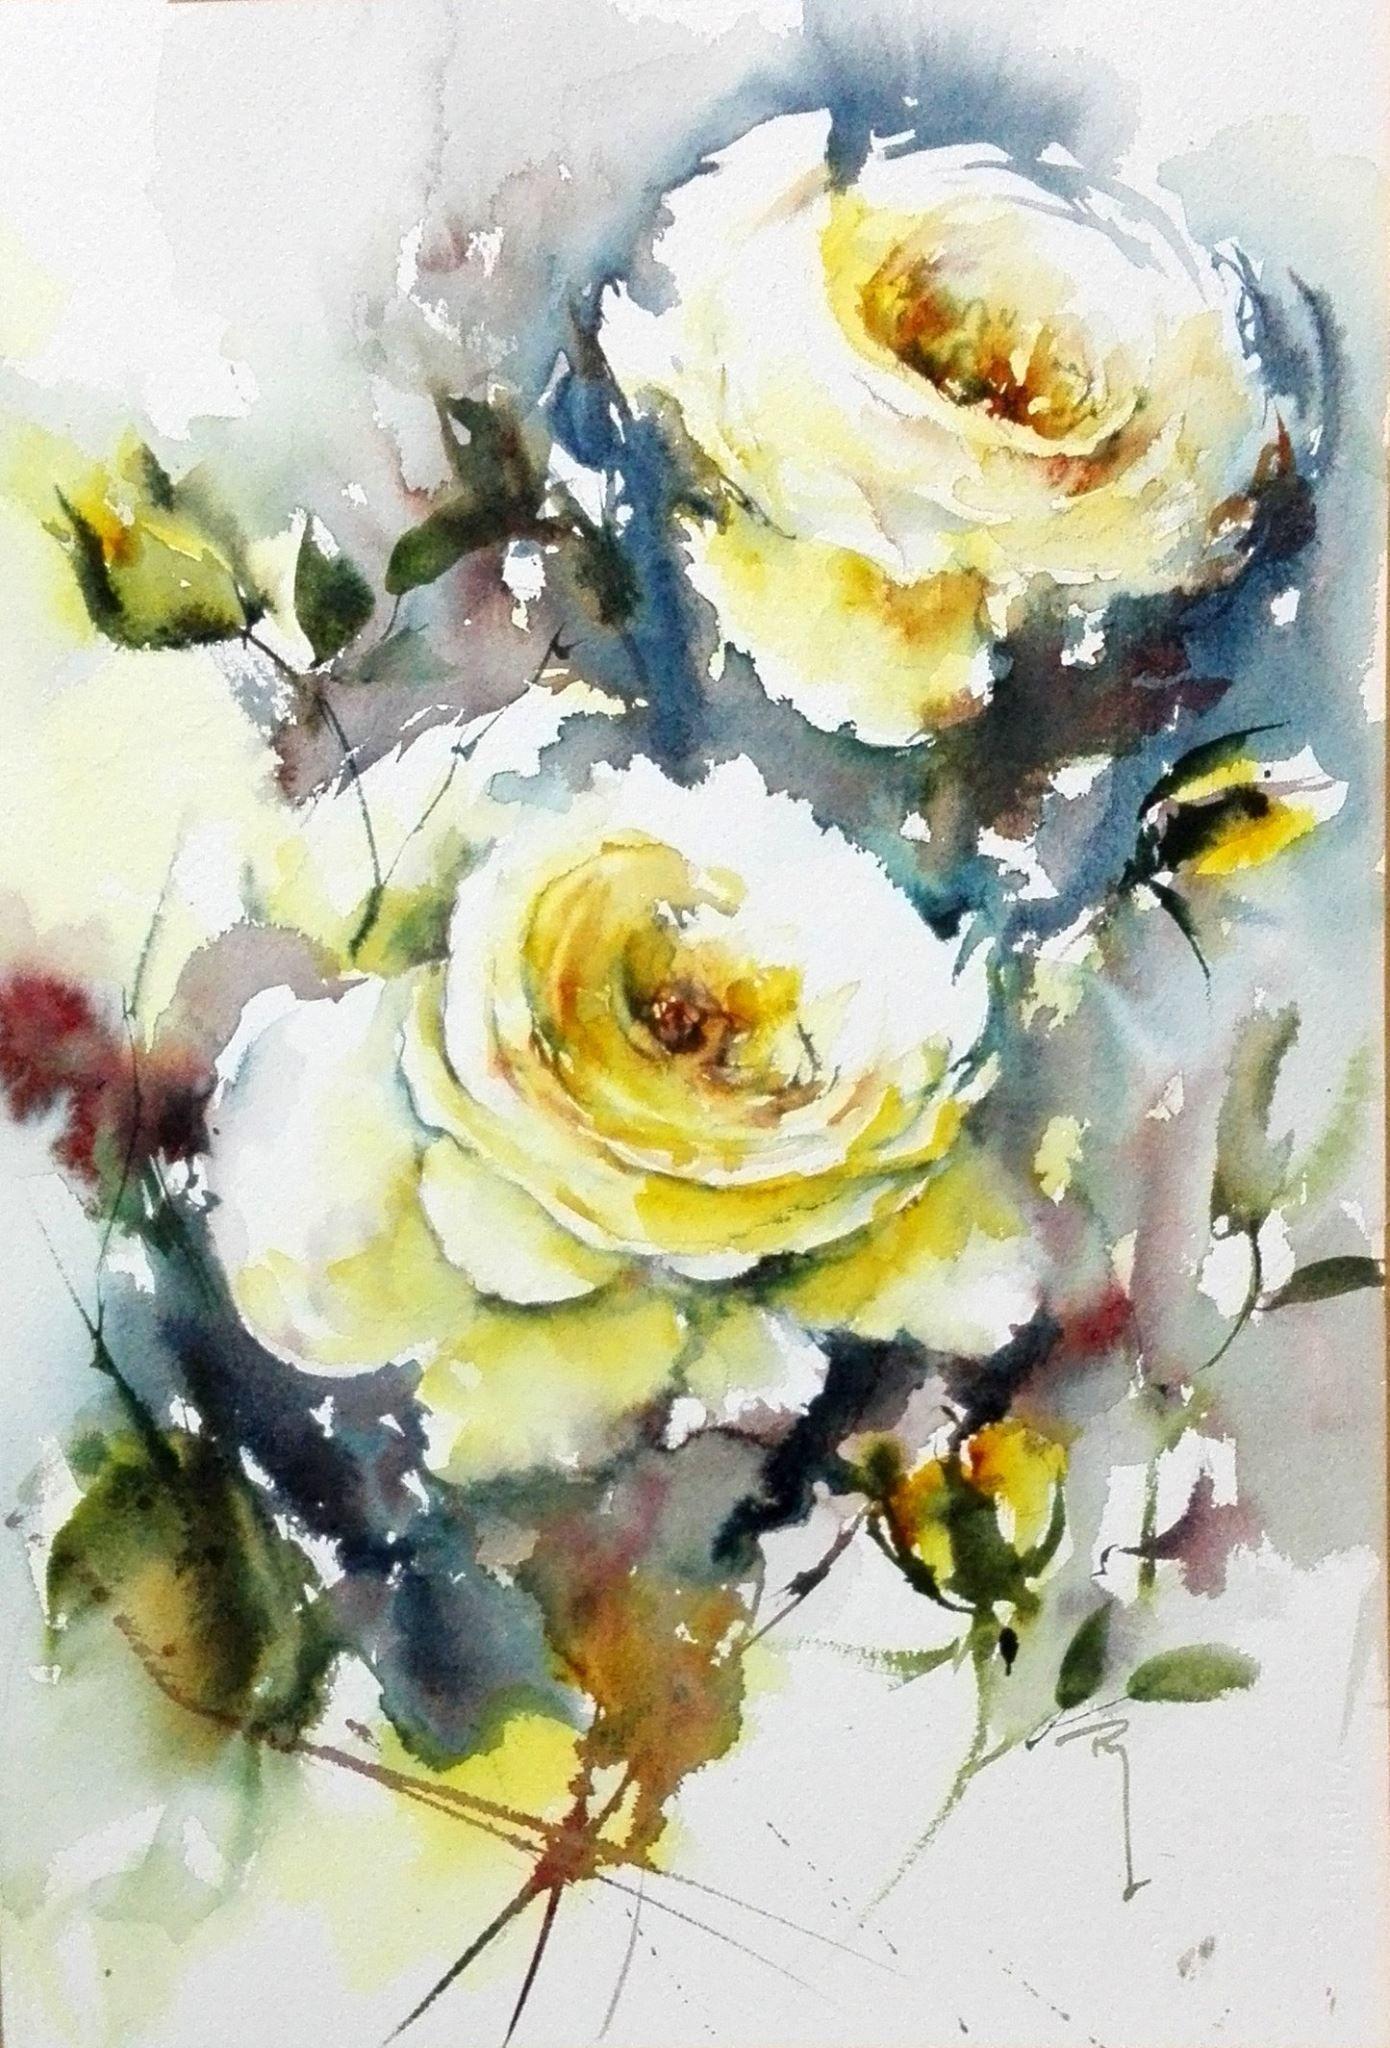 Roses blanches aquarelle roses jean claude papeix for Aquarelle fleurs